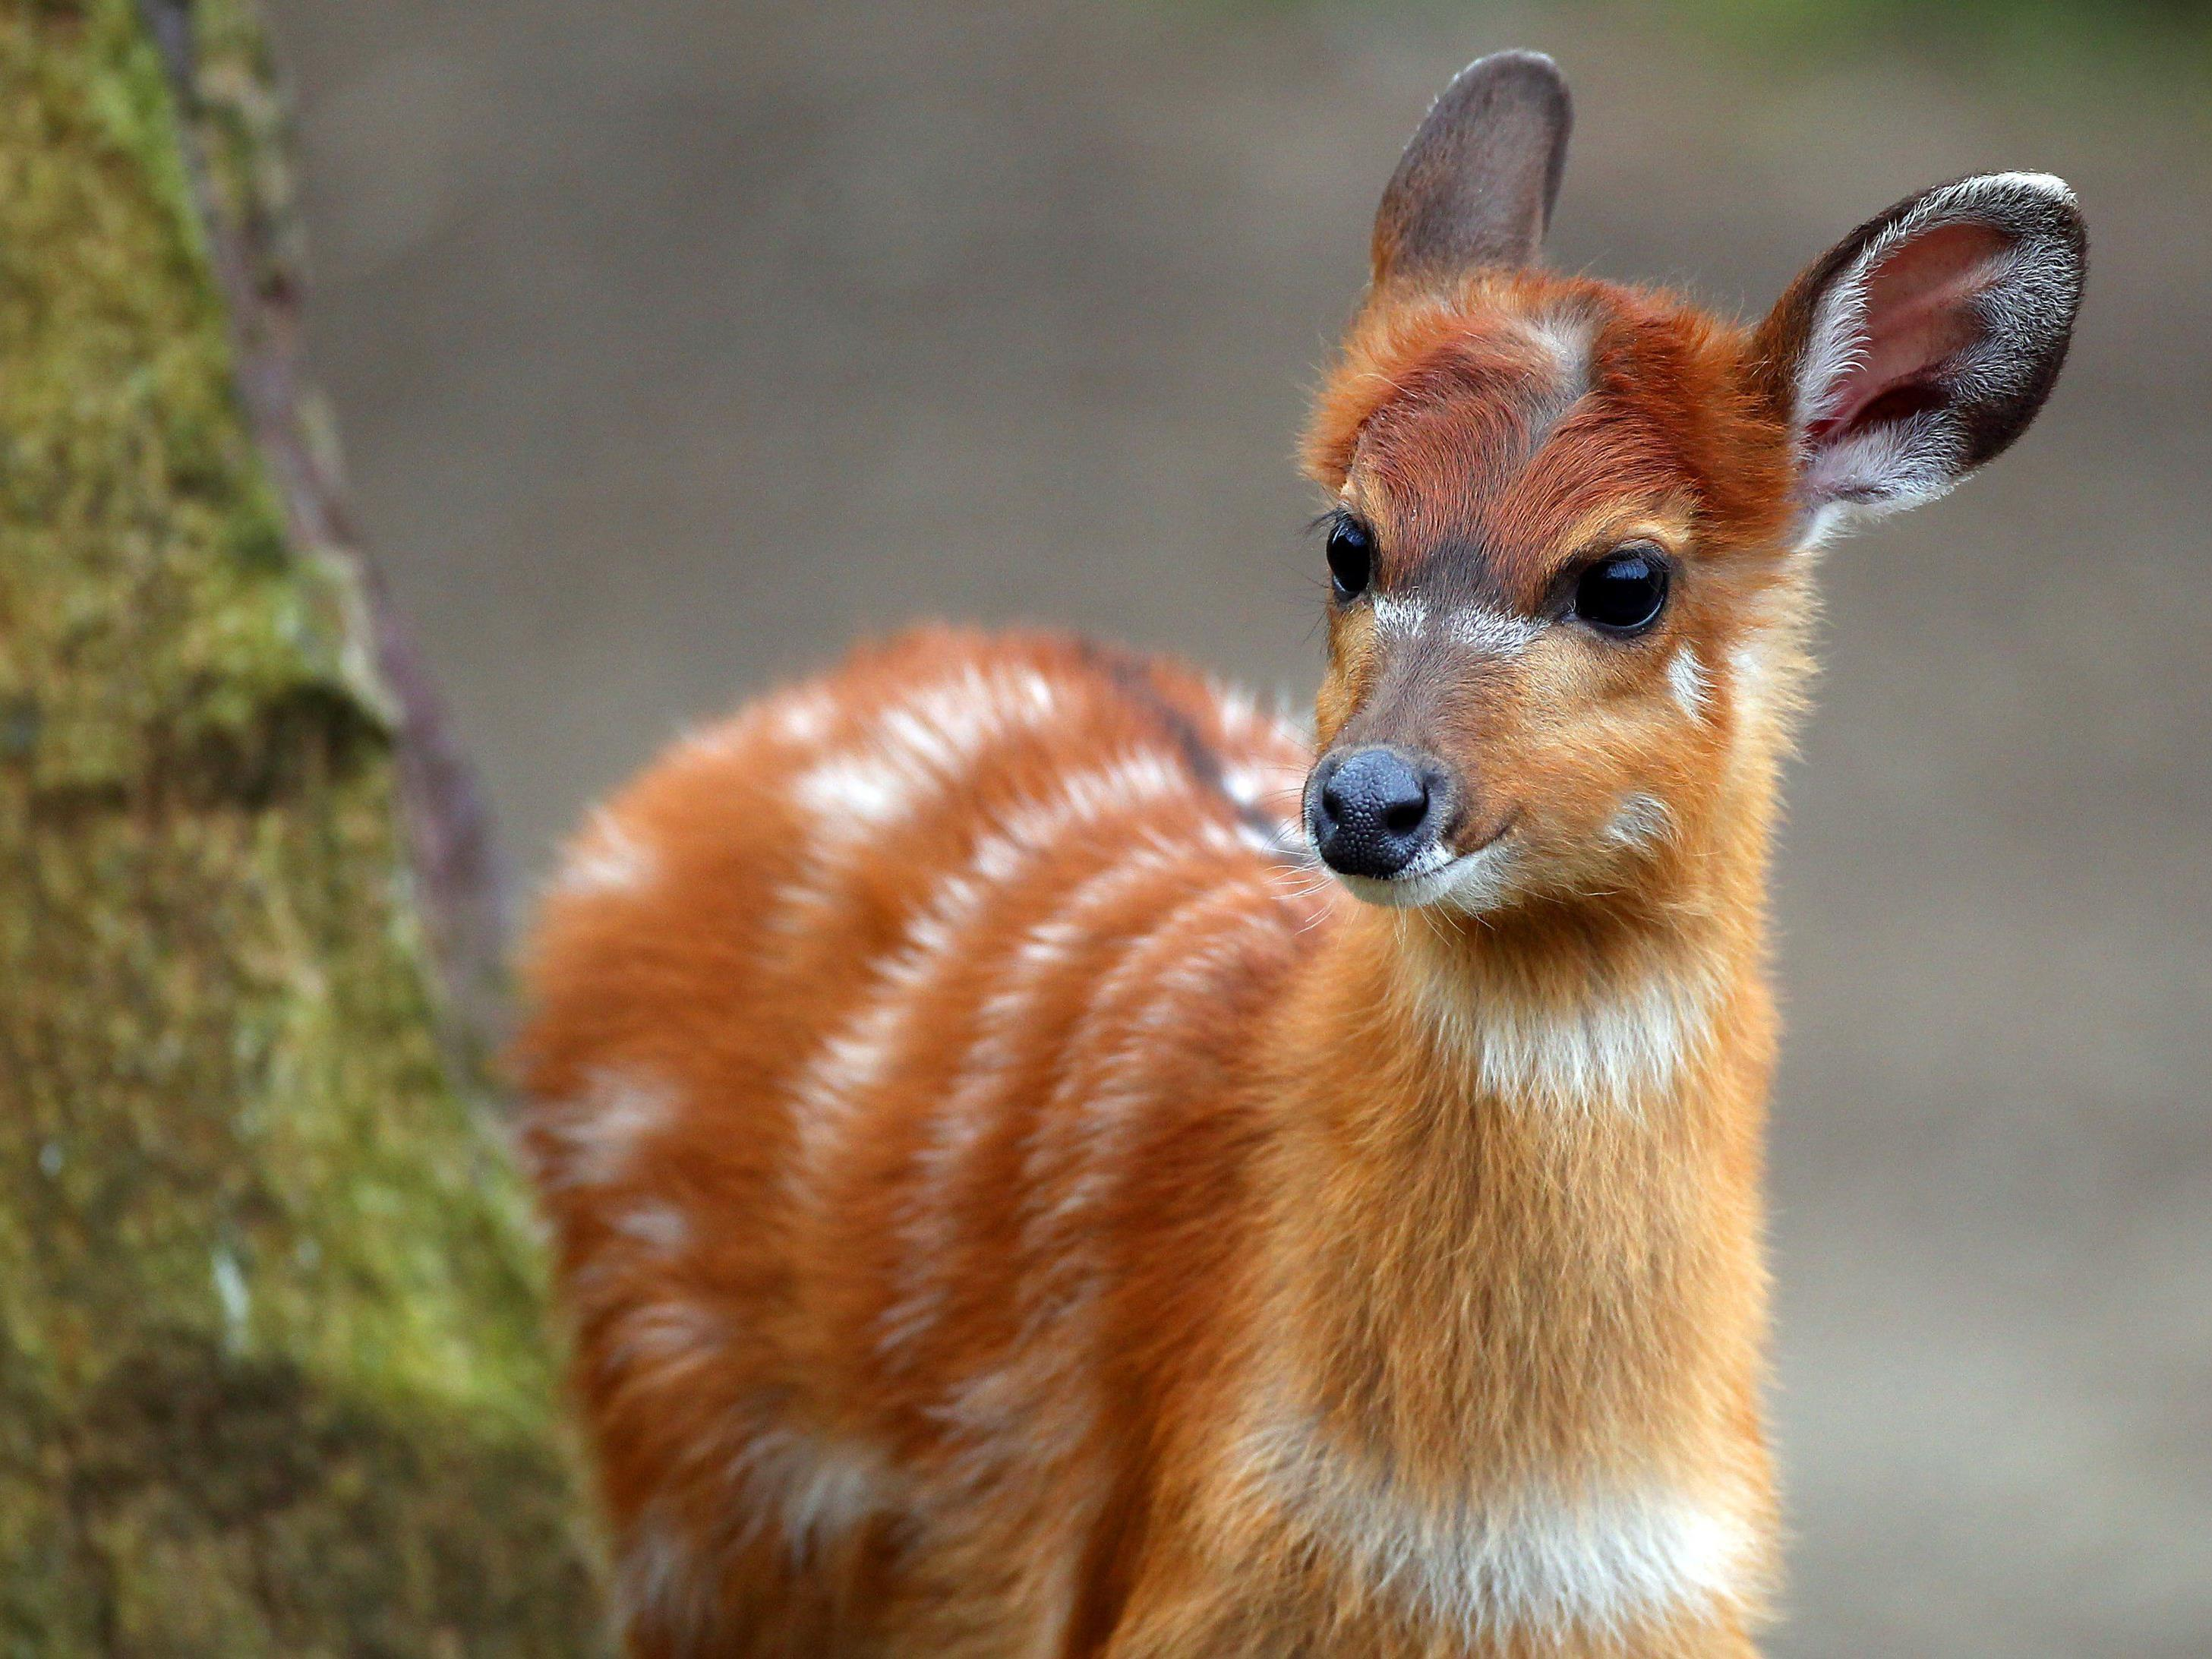 Sitatunga-Antilopen wegen fehlender Papiere eingeschläfert.